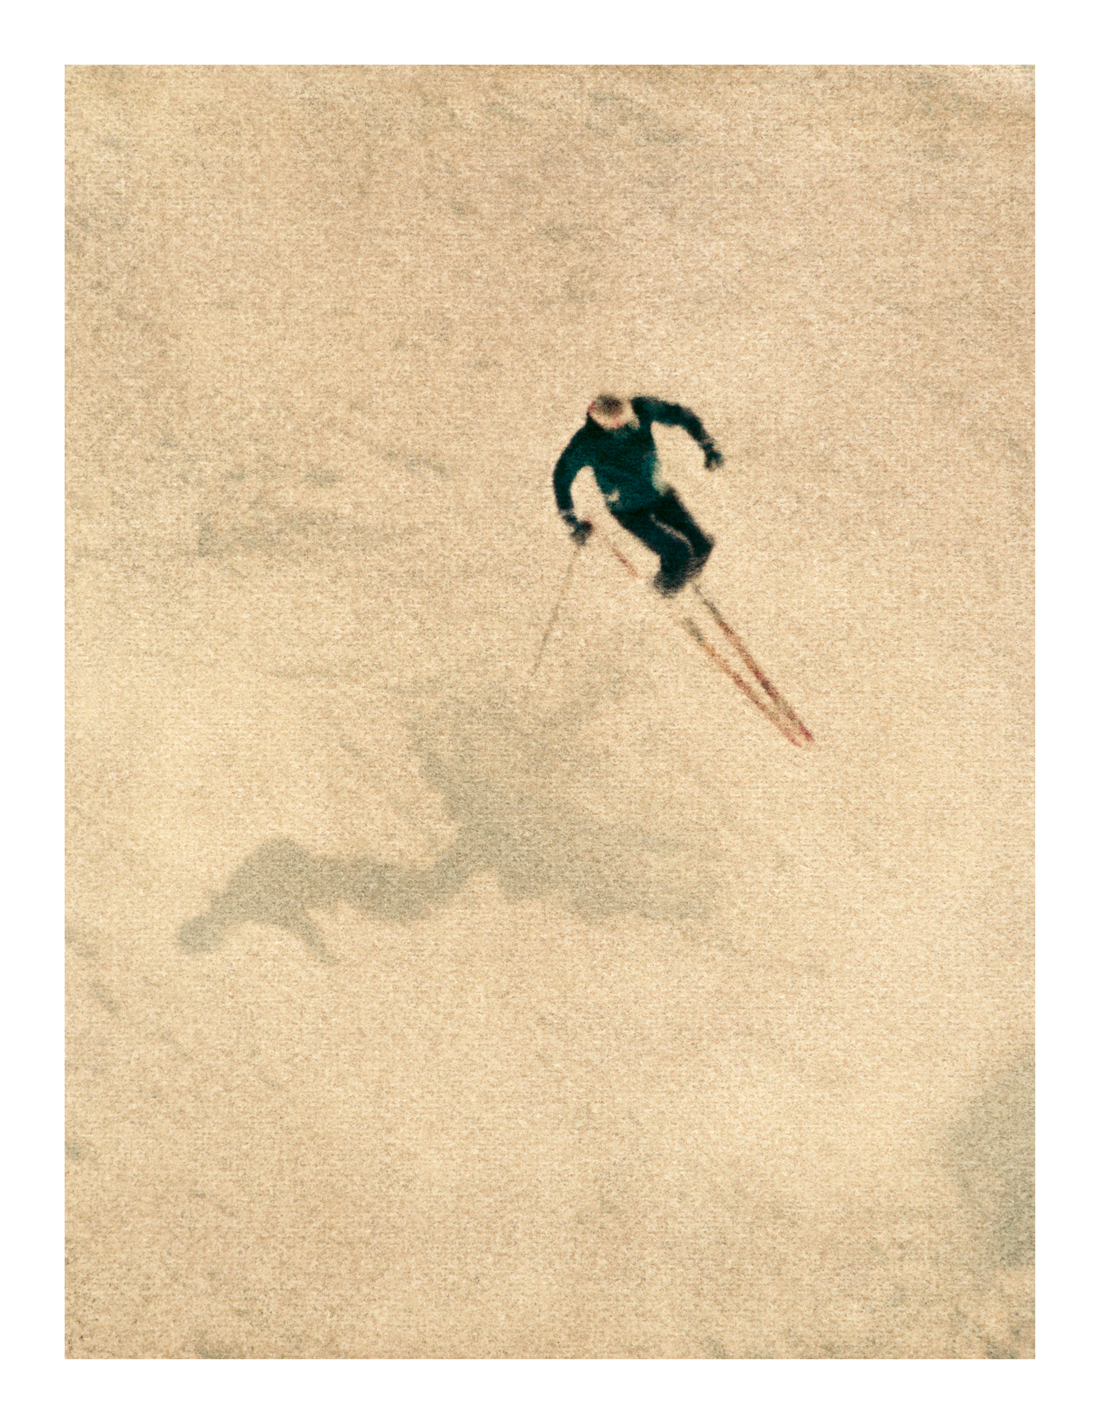 Aspen #4, 2007 (1996)